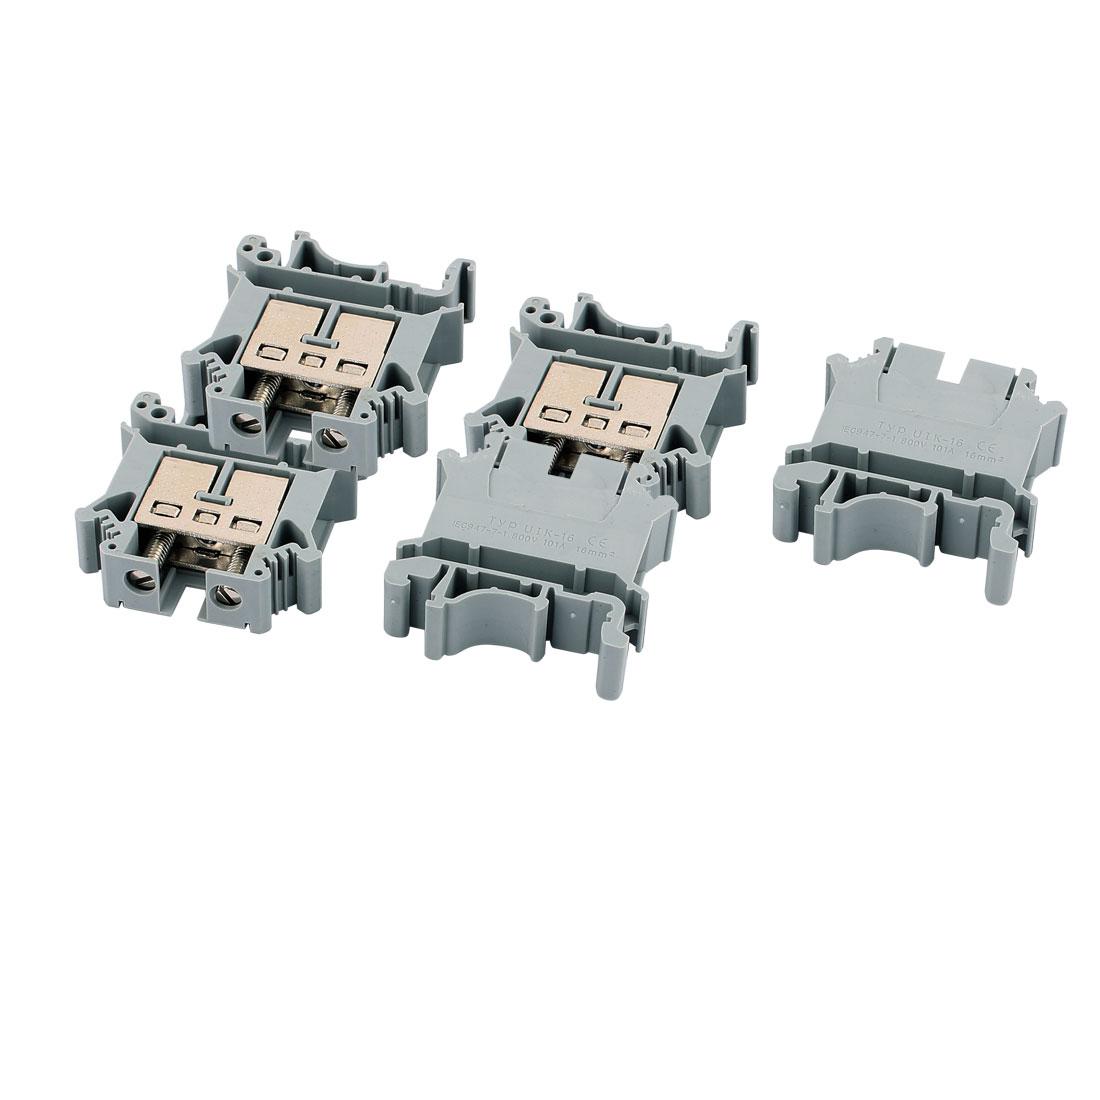 5 Pcs 101A 800V UK-16B Screw Contact Terminal Block Connector Gray